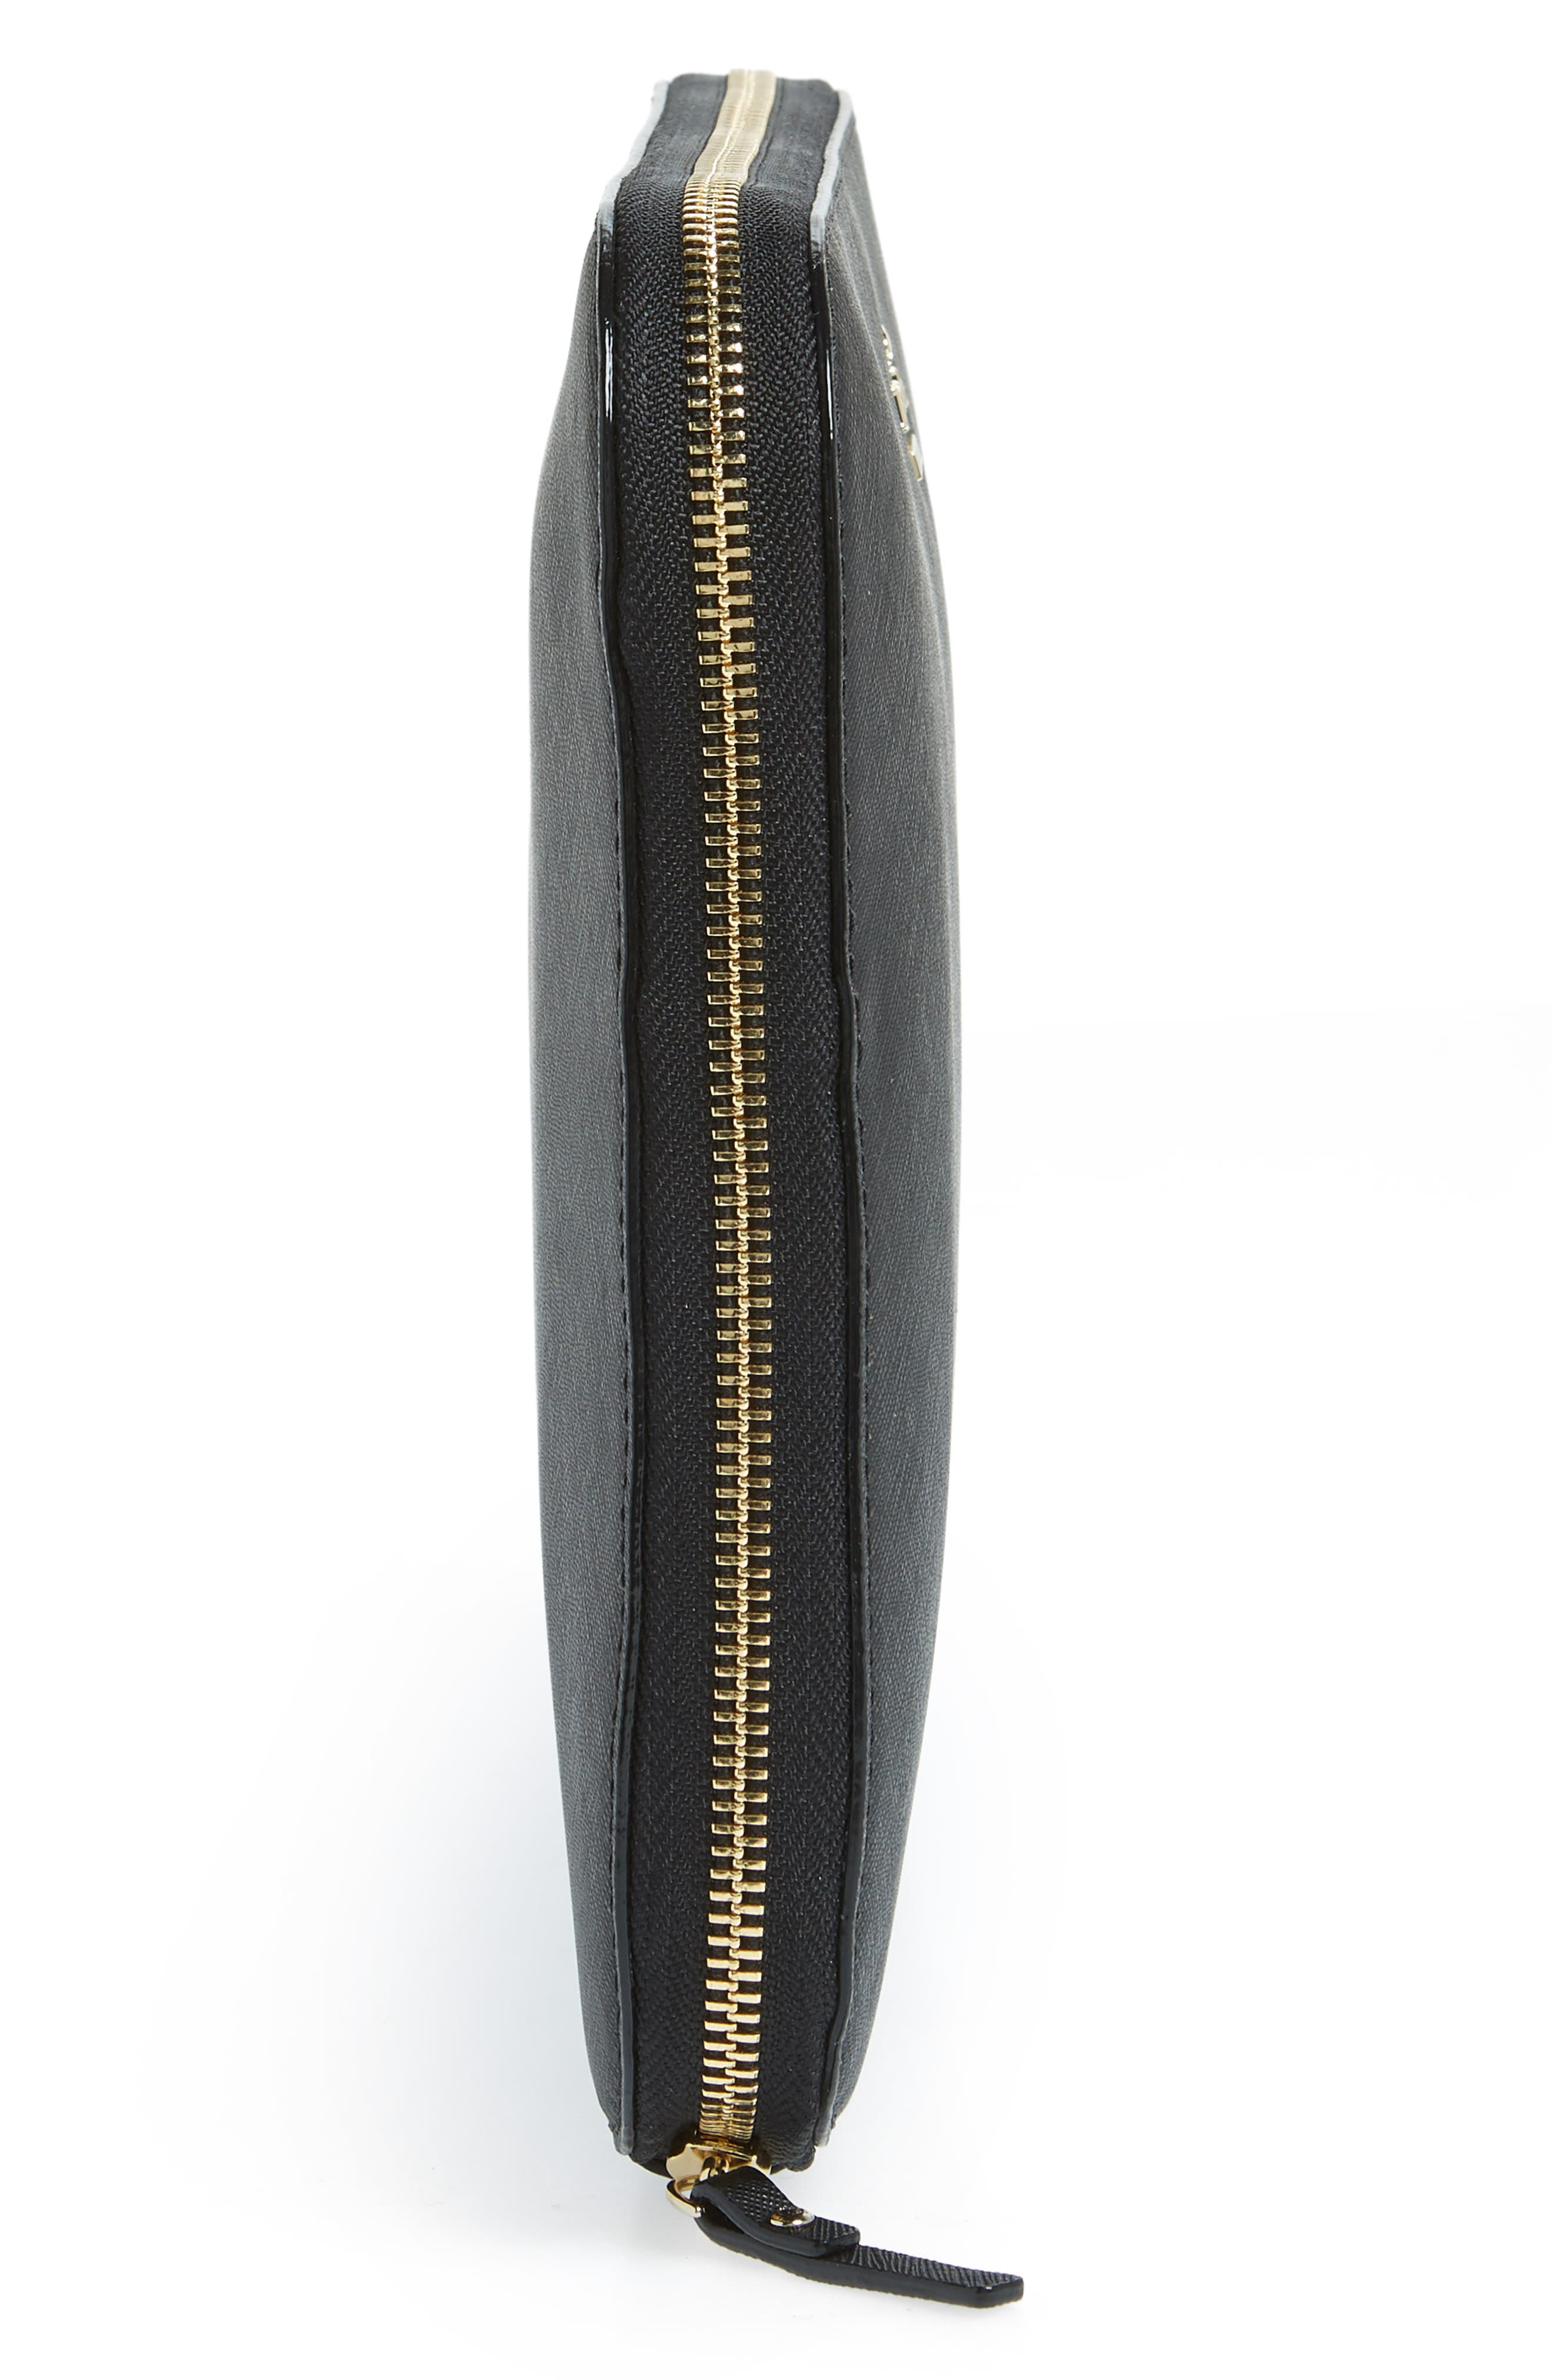 saffiano leather organization tablet sleeve,                             Alternate thumbnail 3, color,                             Black